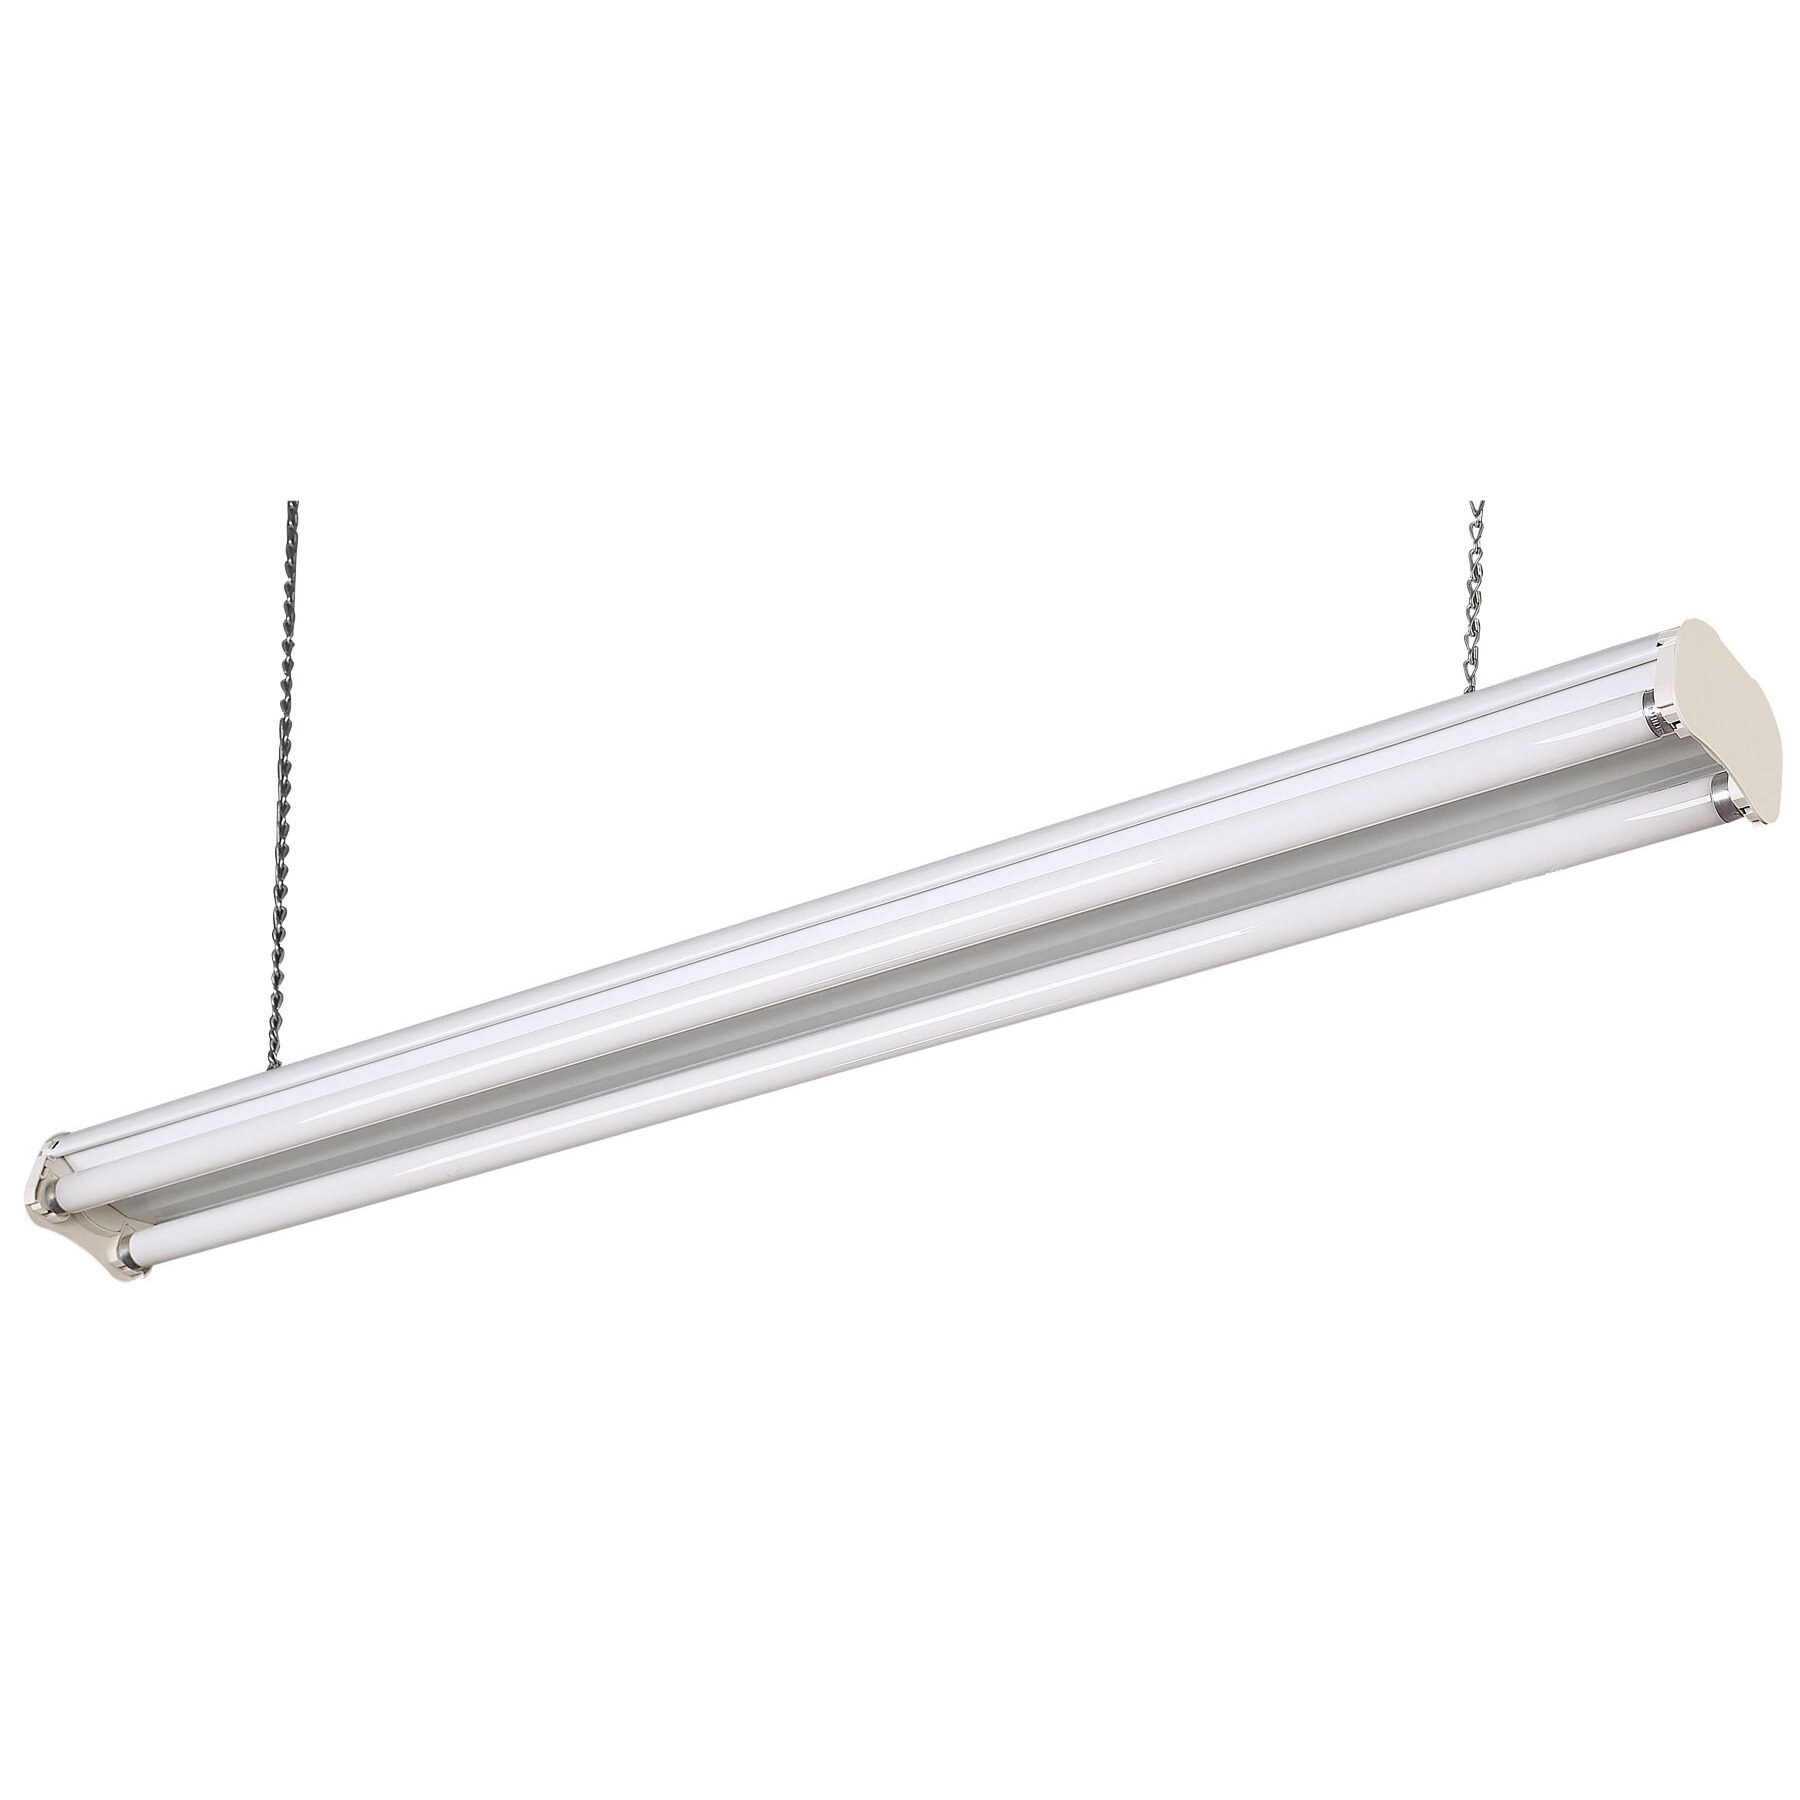 Shop Canarm Efs848232c 48 Fluorescent Shop Light Overstock 11638452